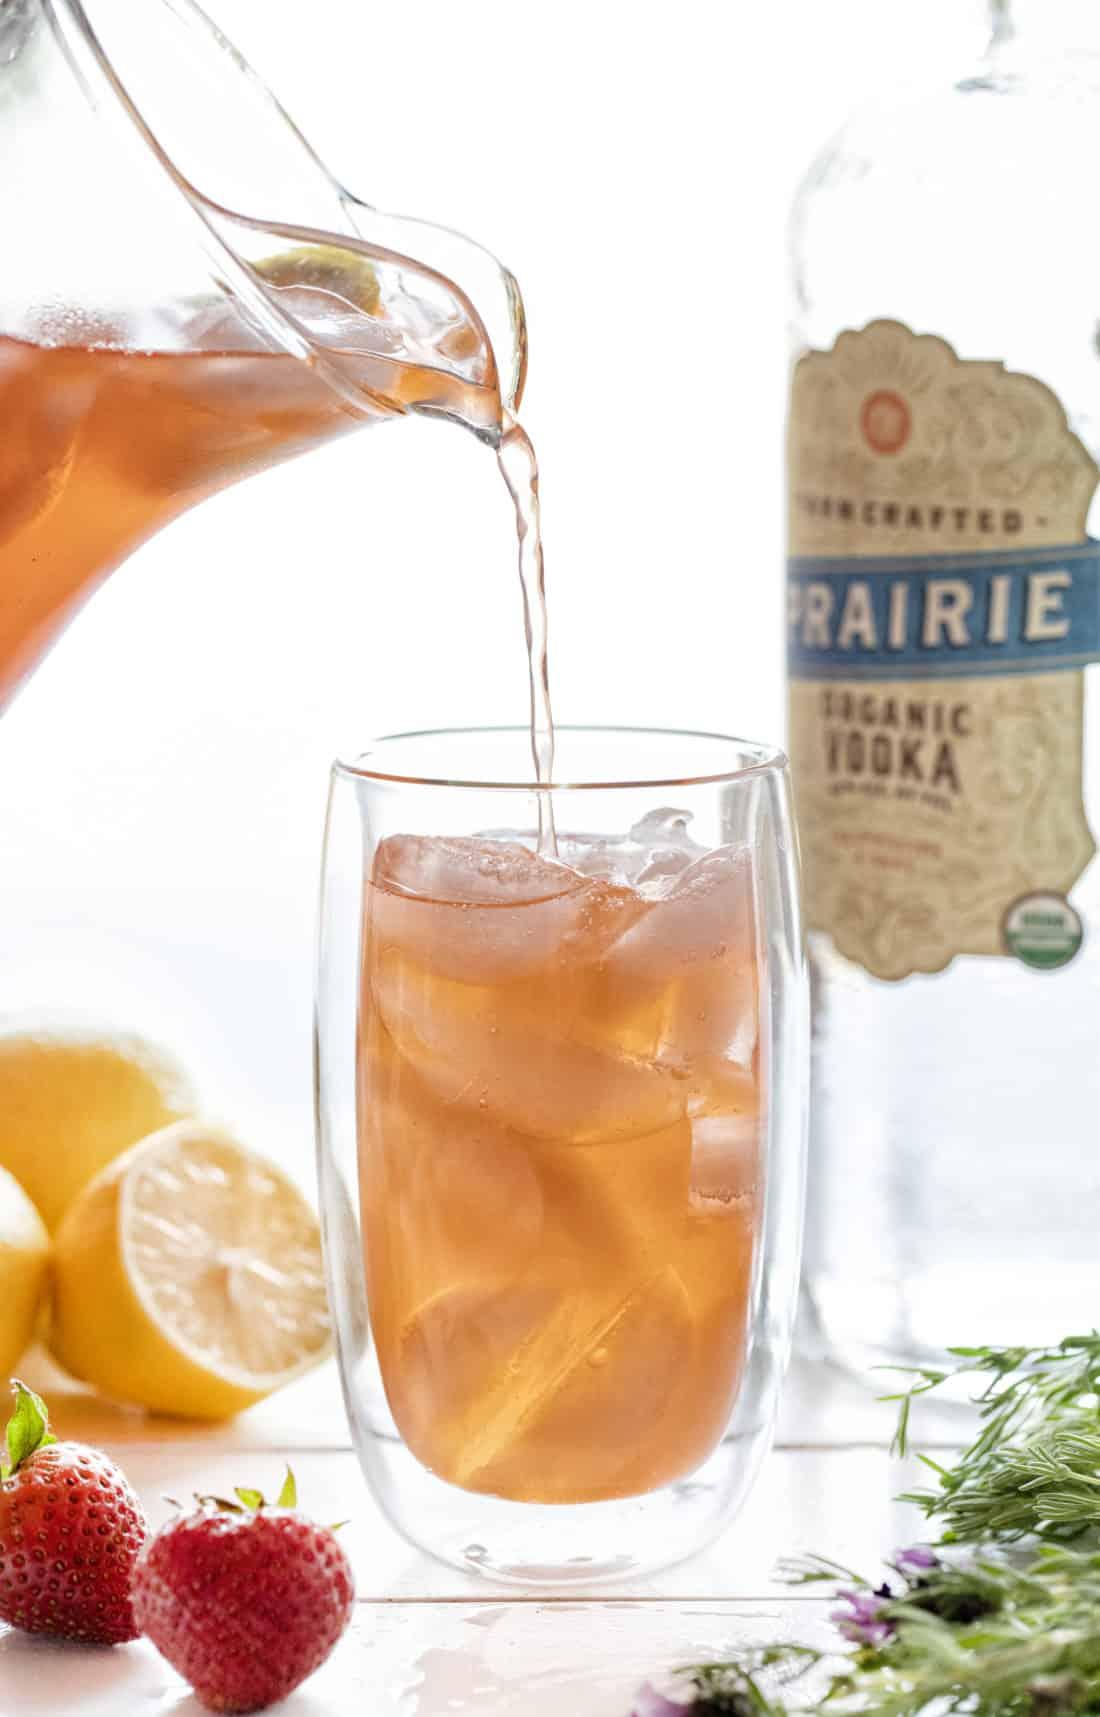 Limonada de fresa y lavanda con vodka